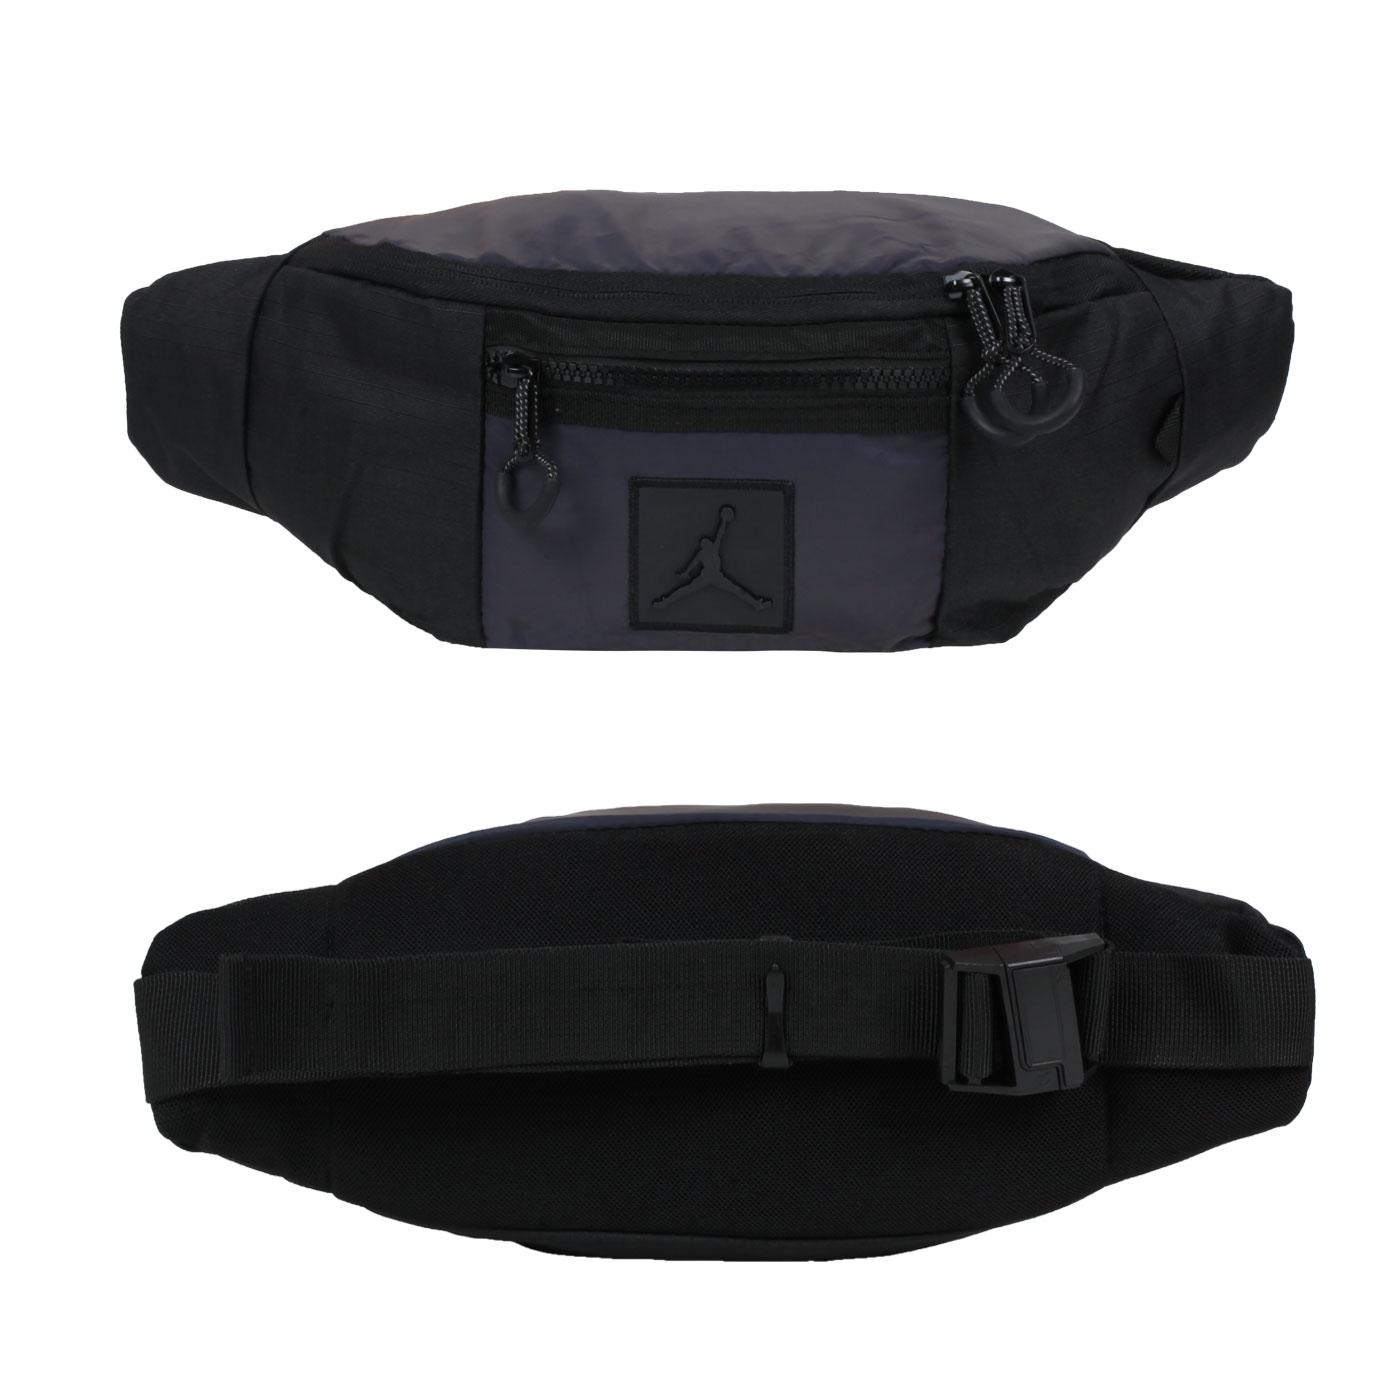 NIKE JORDAN 中型腰包 JD2143012GS-001